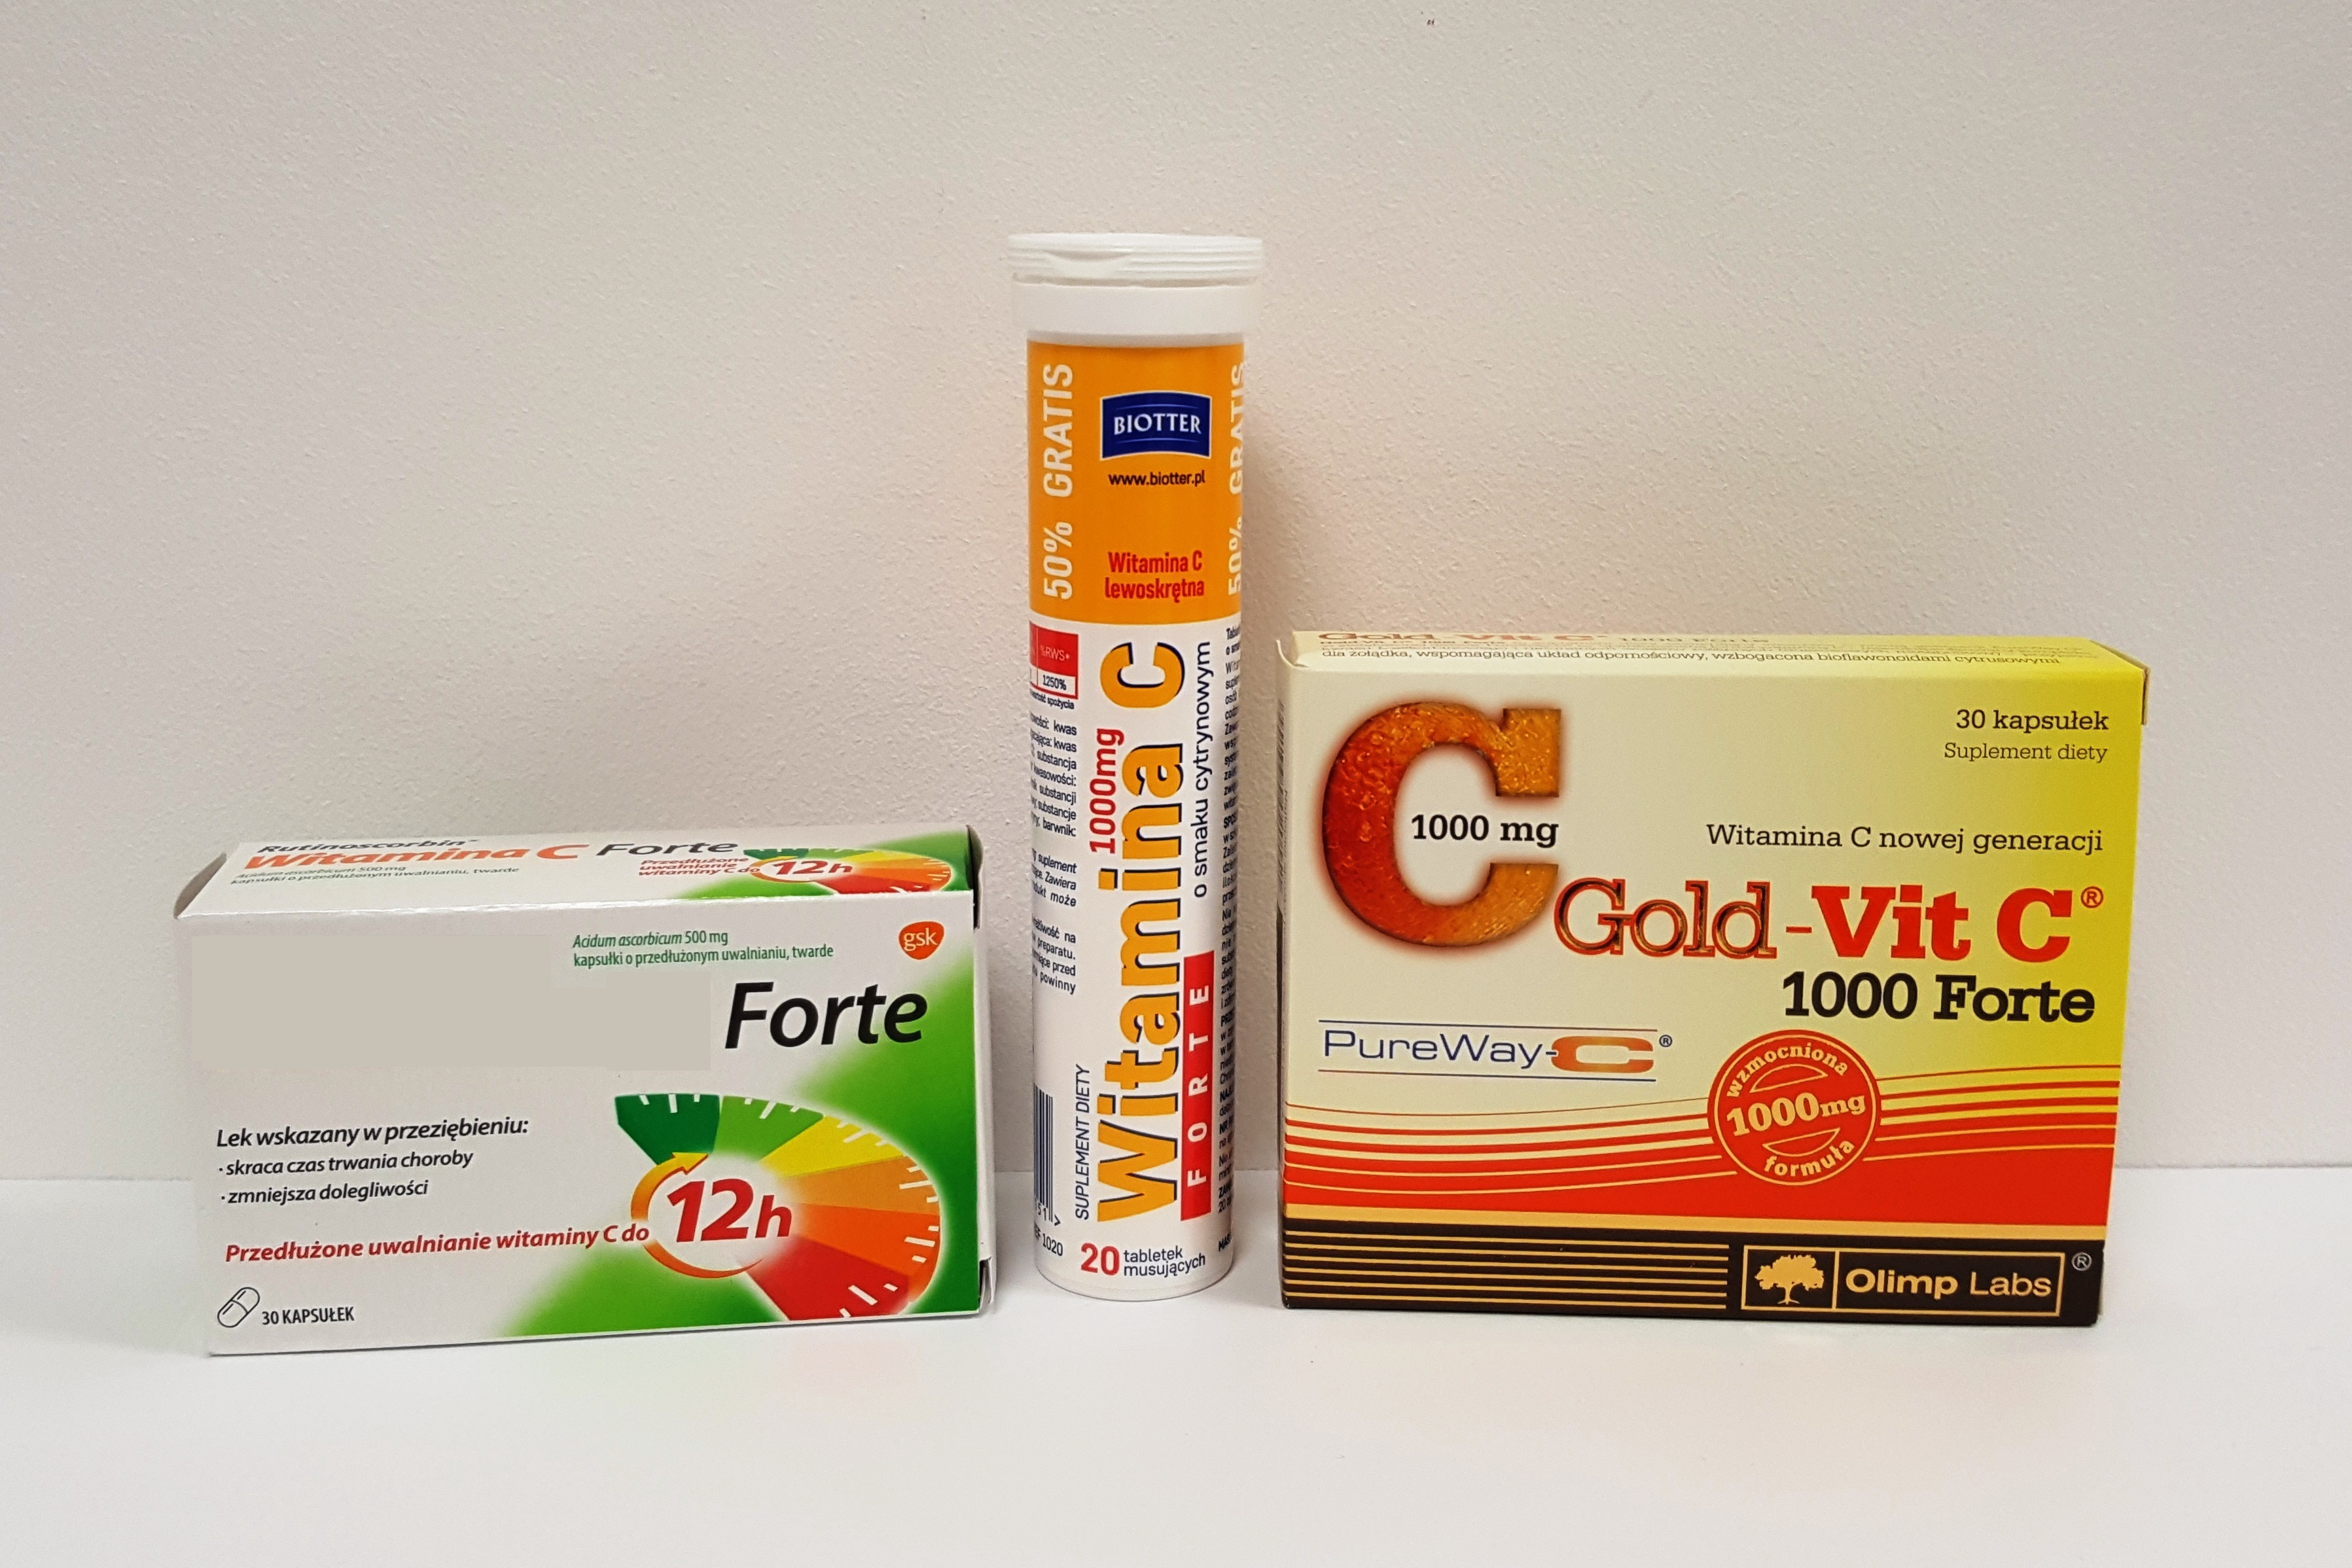 Witamina C 500-1000 mg, Rutinoscorbin Witamina C Forte Olimp Gold-Vit C 1000 Forte Matka Aptekarka